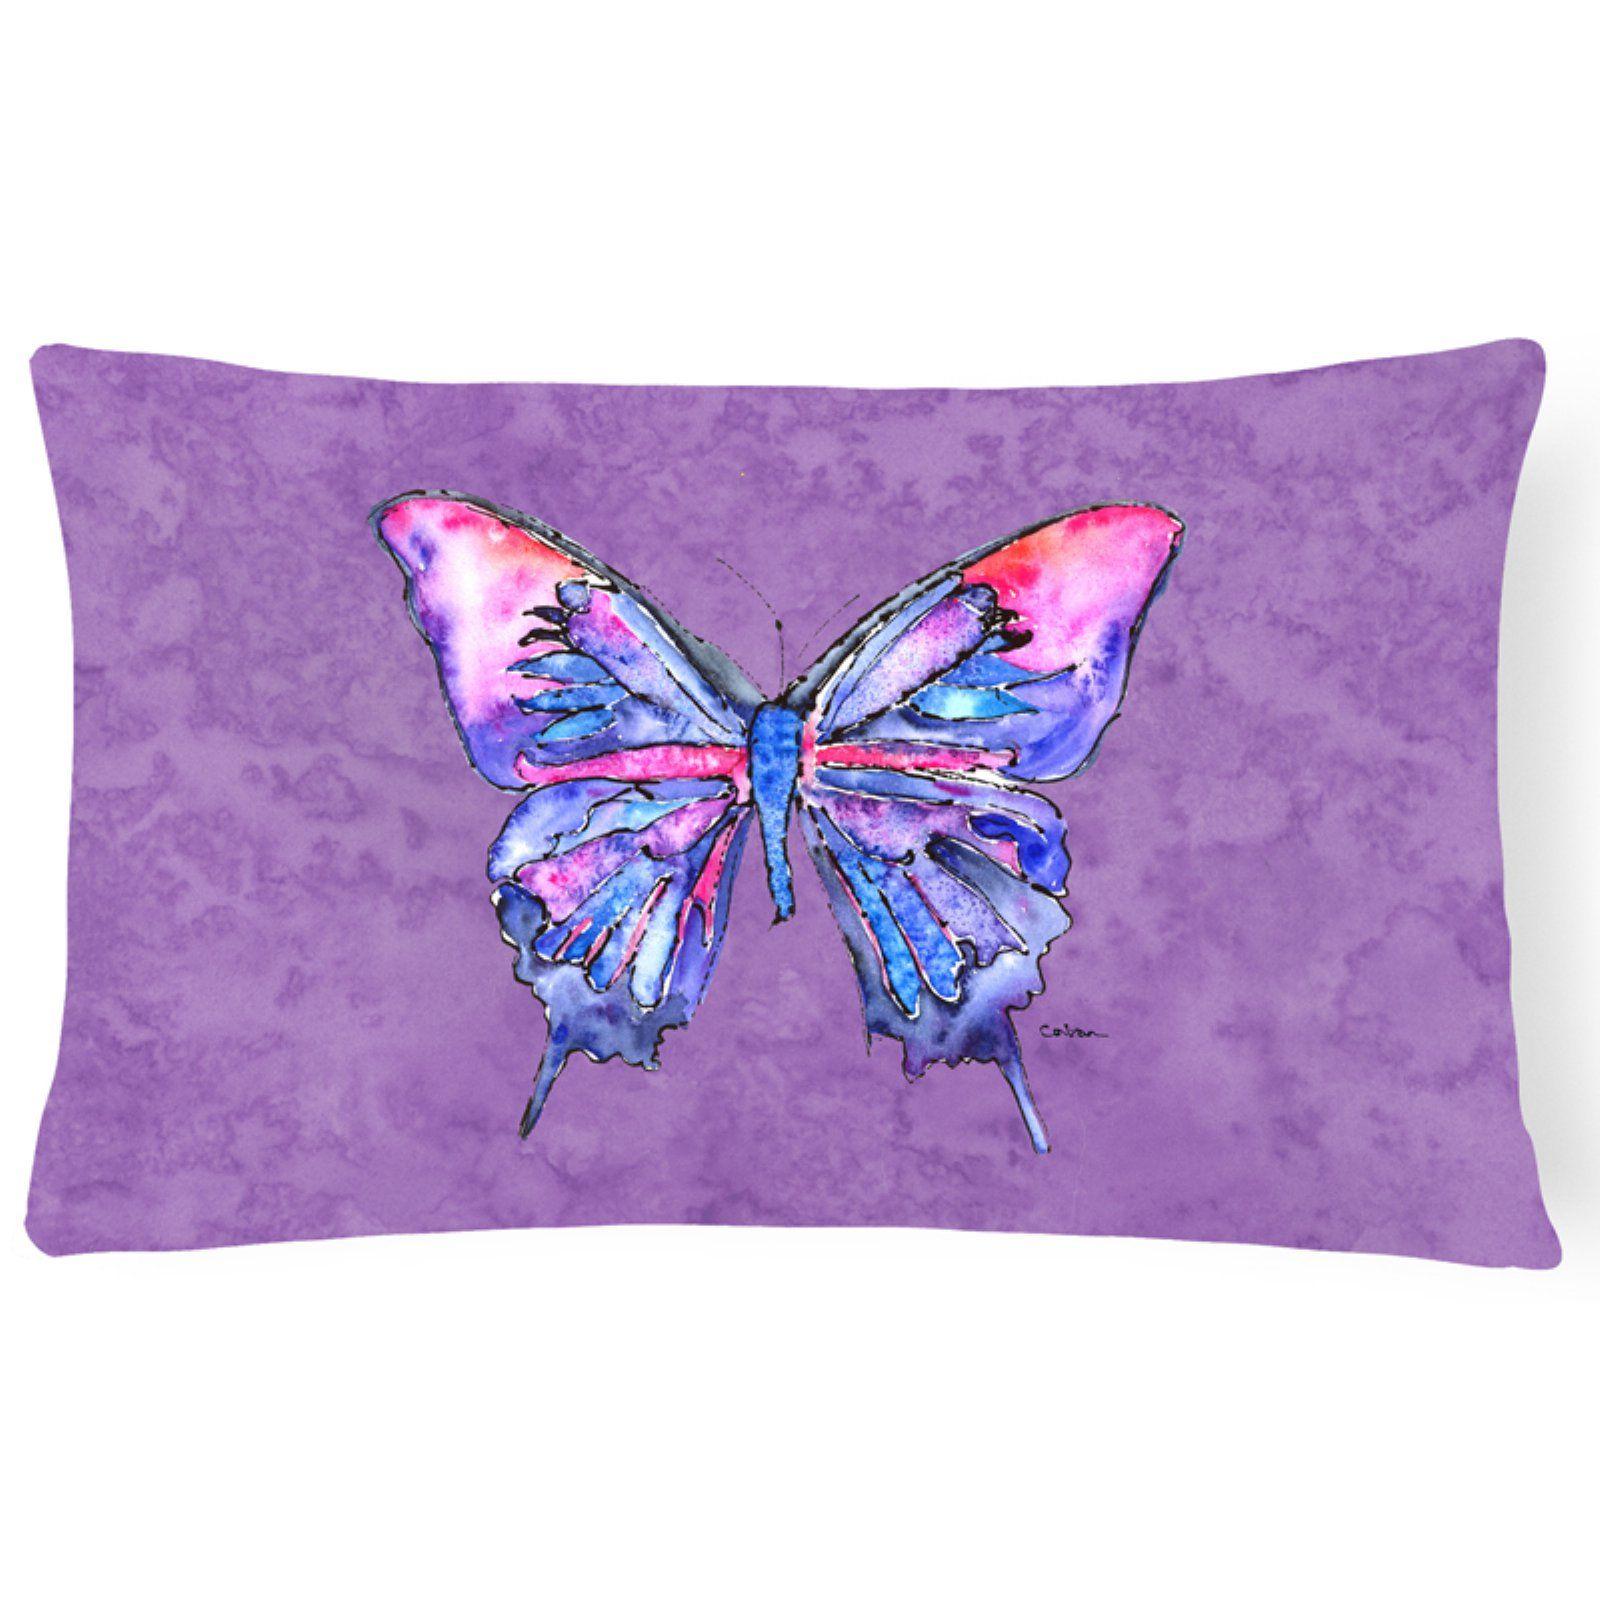 Carolines Treasures Butterfly on Purple Rectangular Decorative Outdoor Pillow